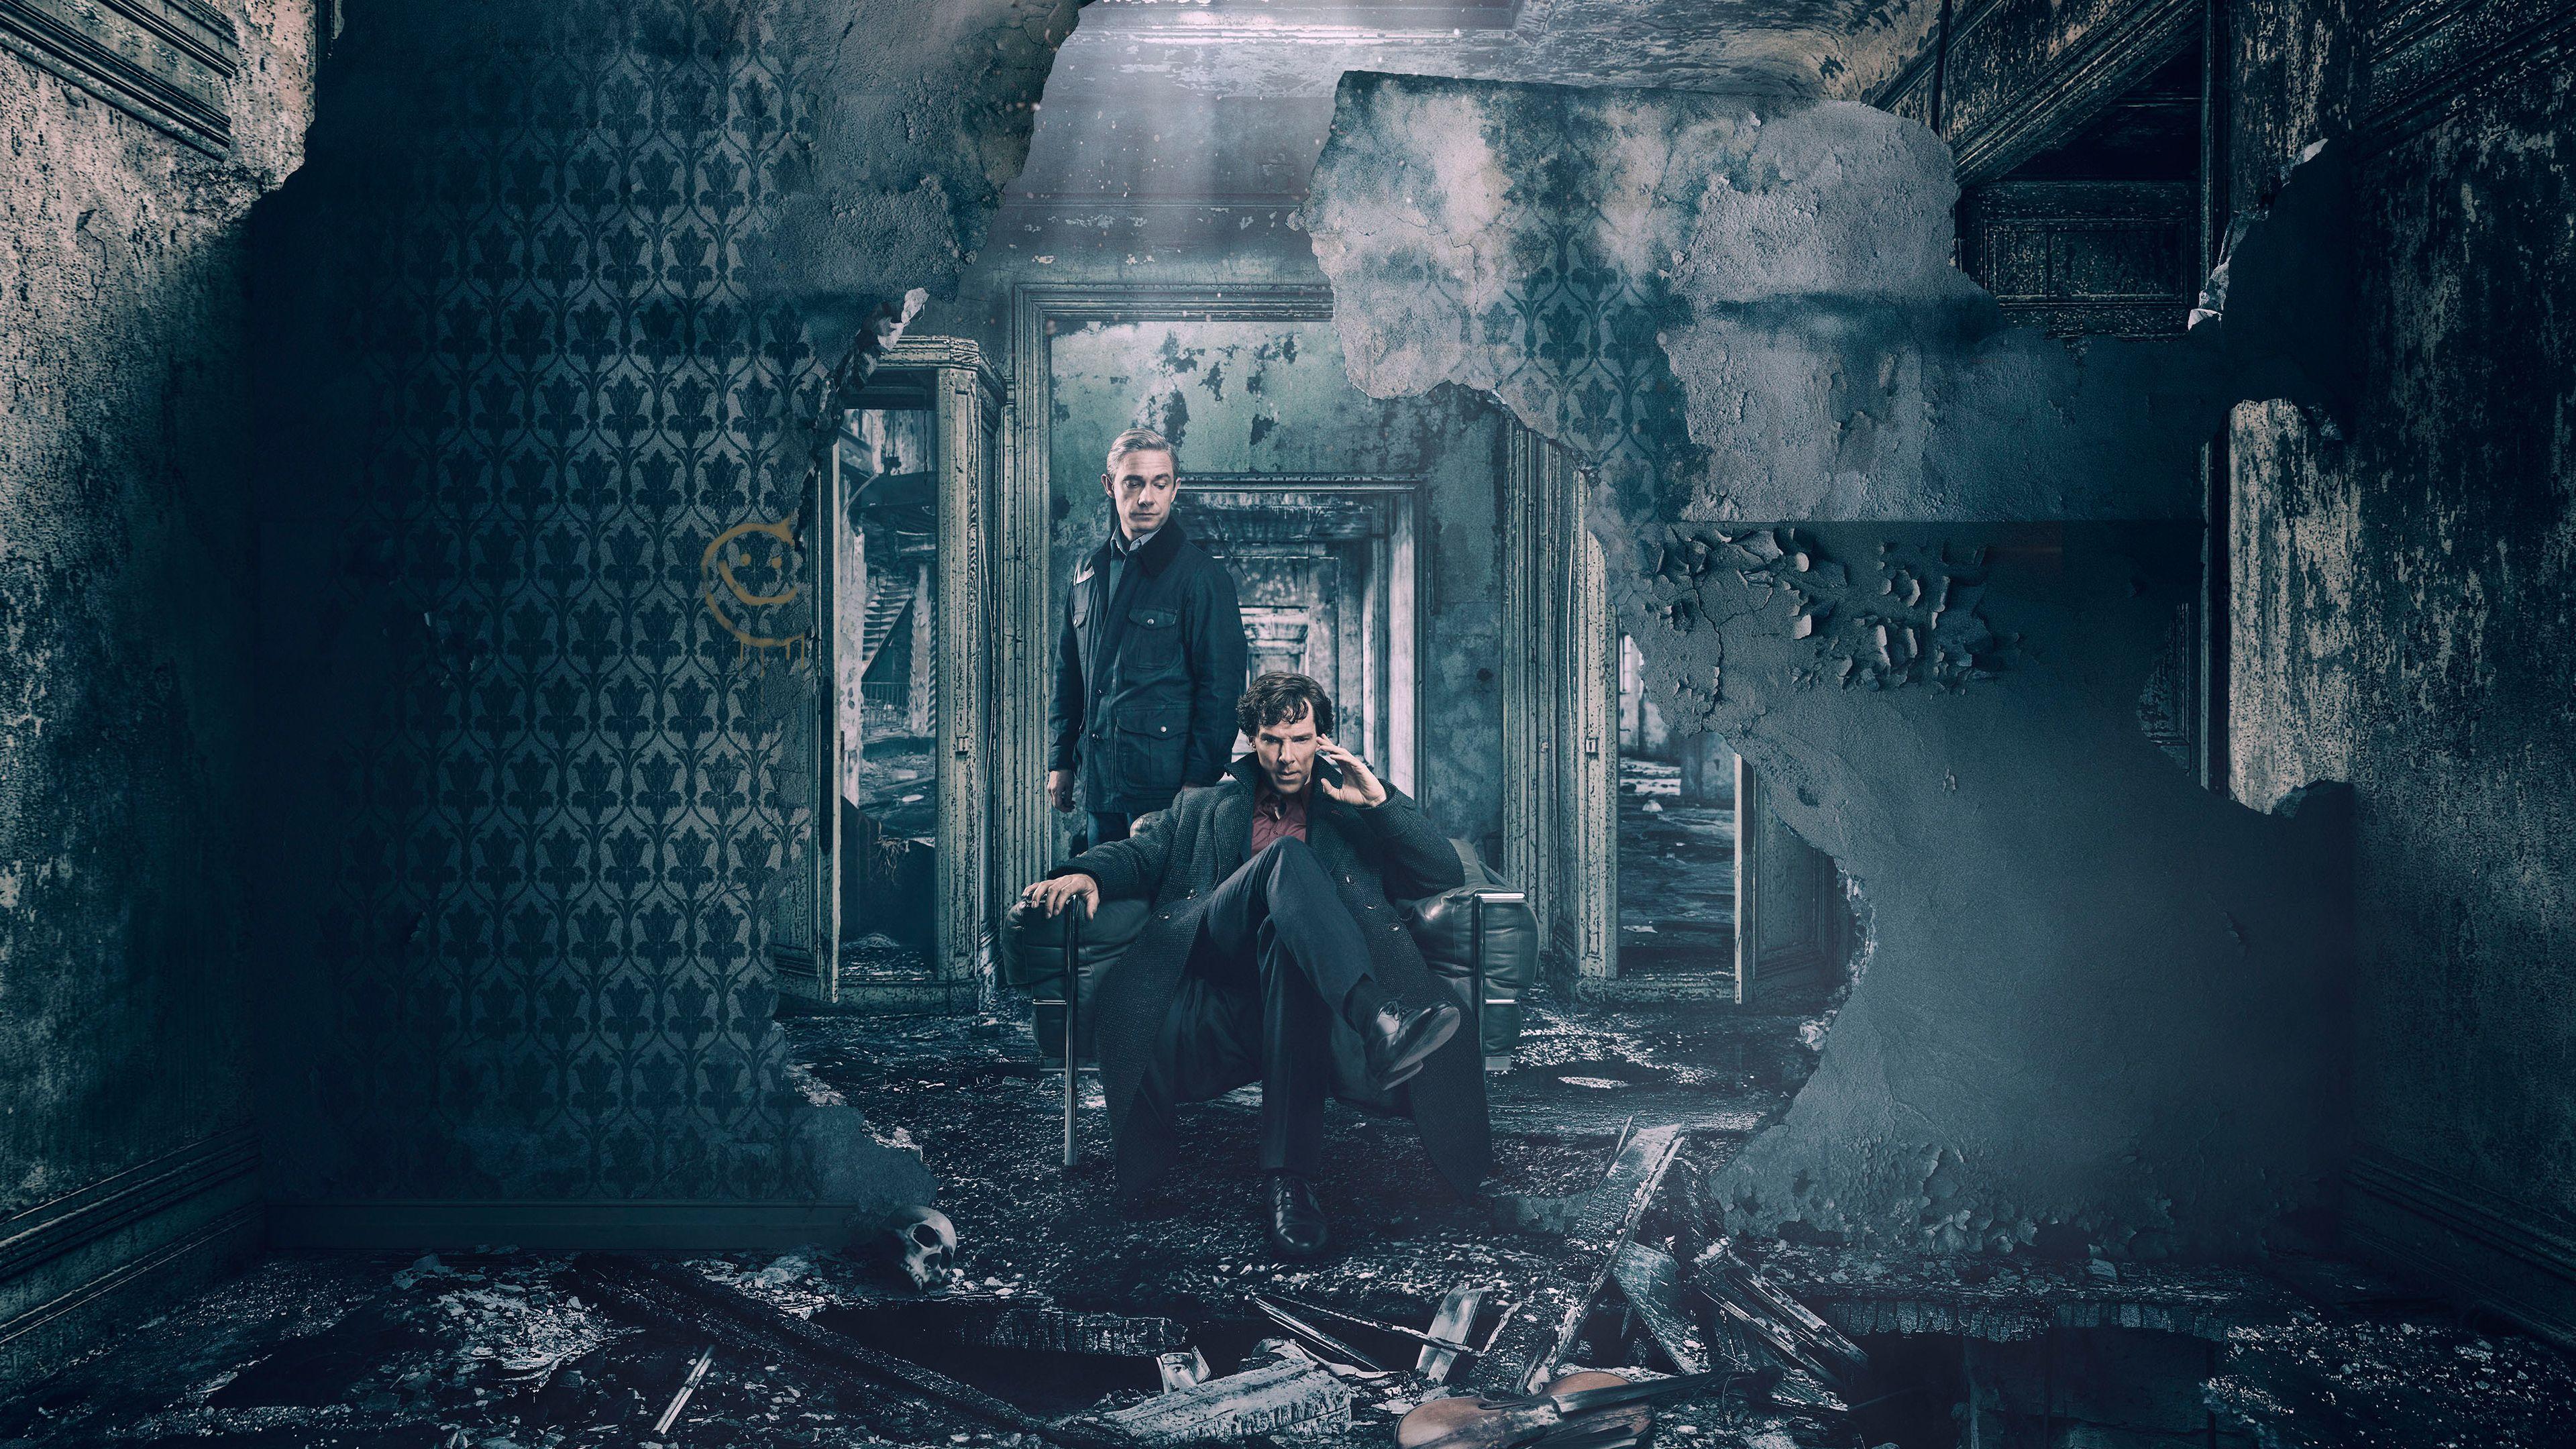 Download DeviantArt More Like BBC Sherlock wallpaper pattern by vinree